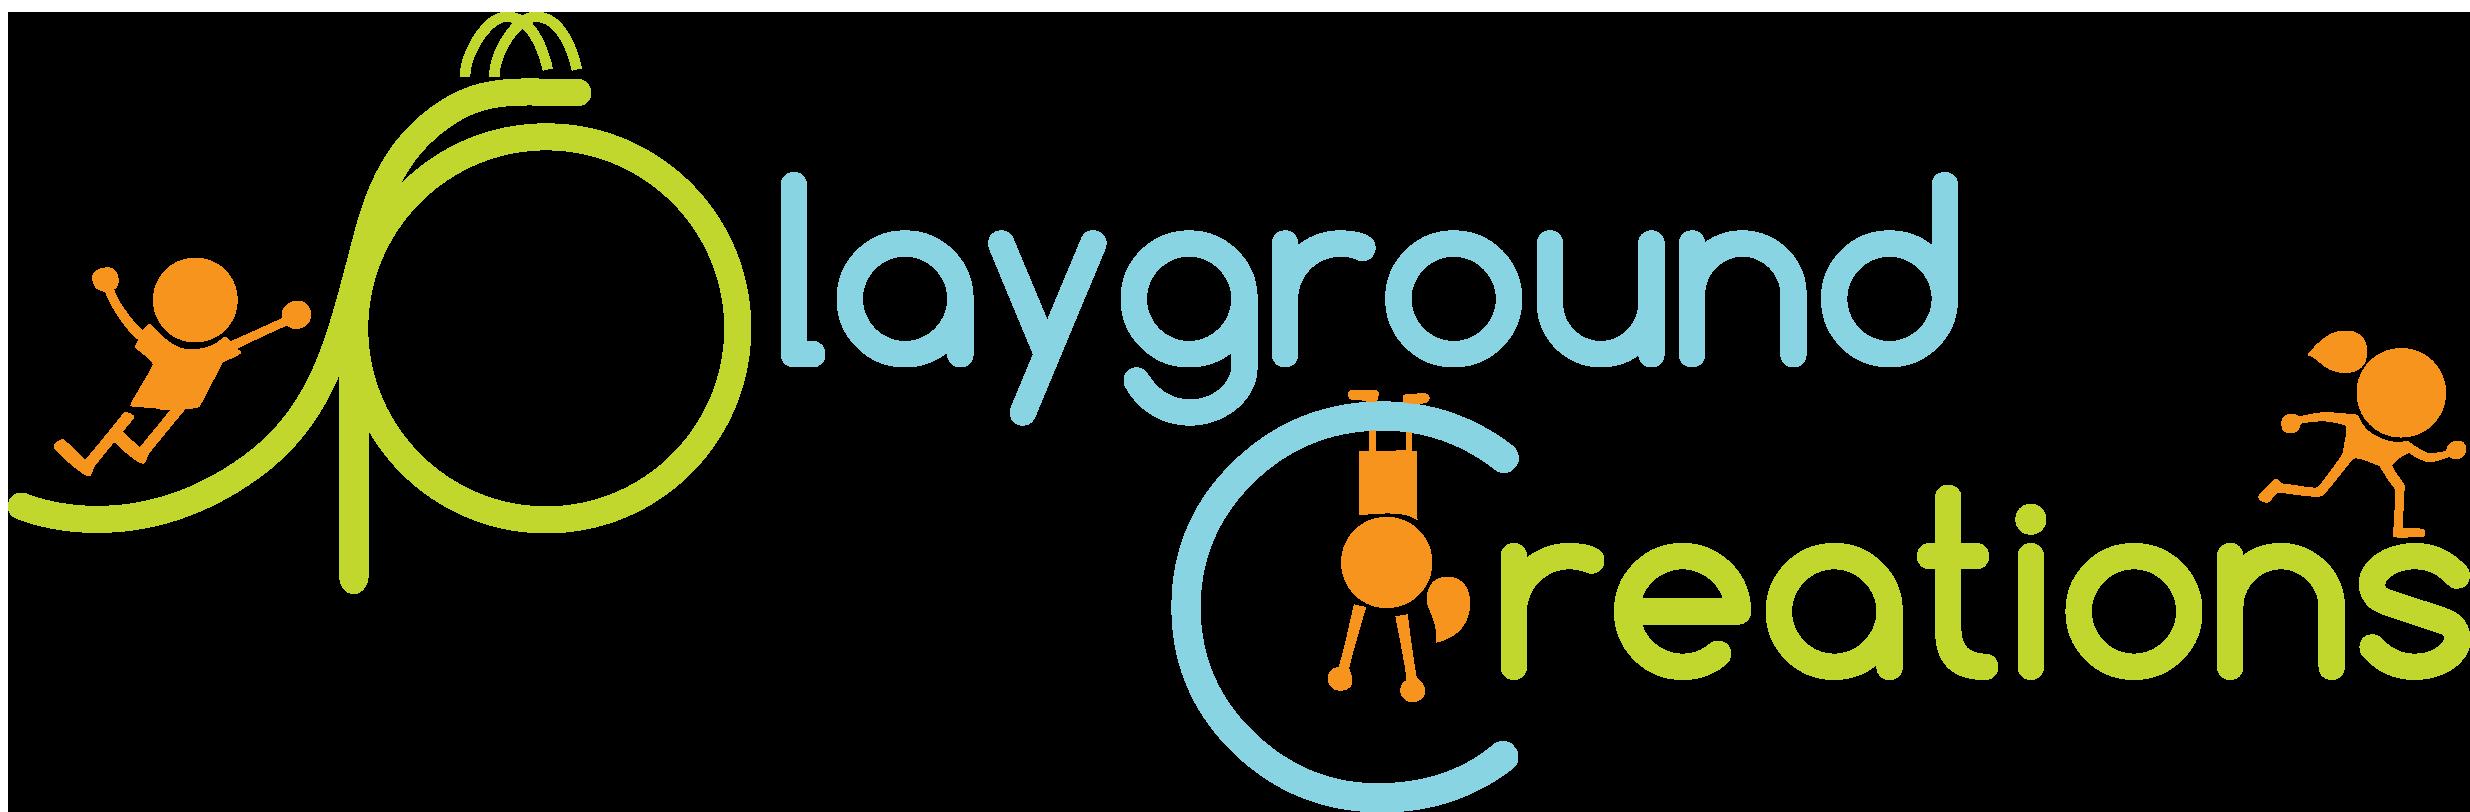 ADS Playground Creations